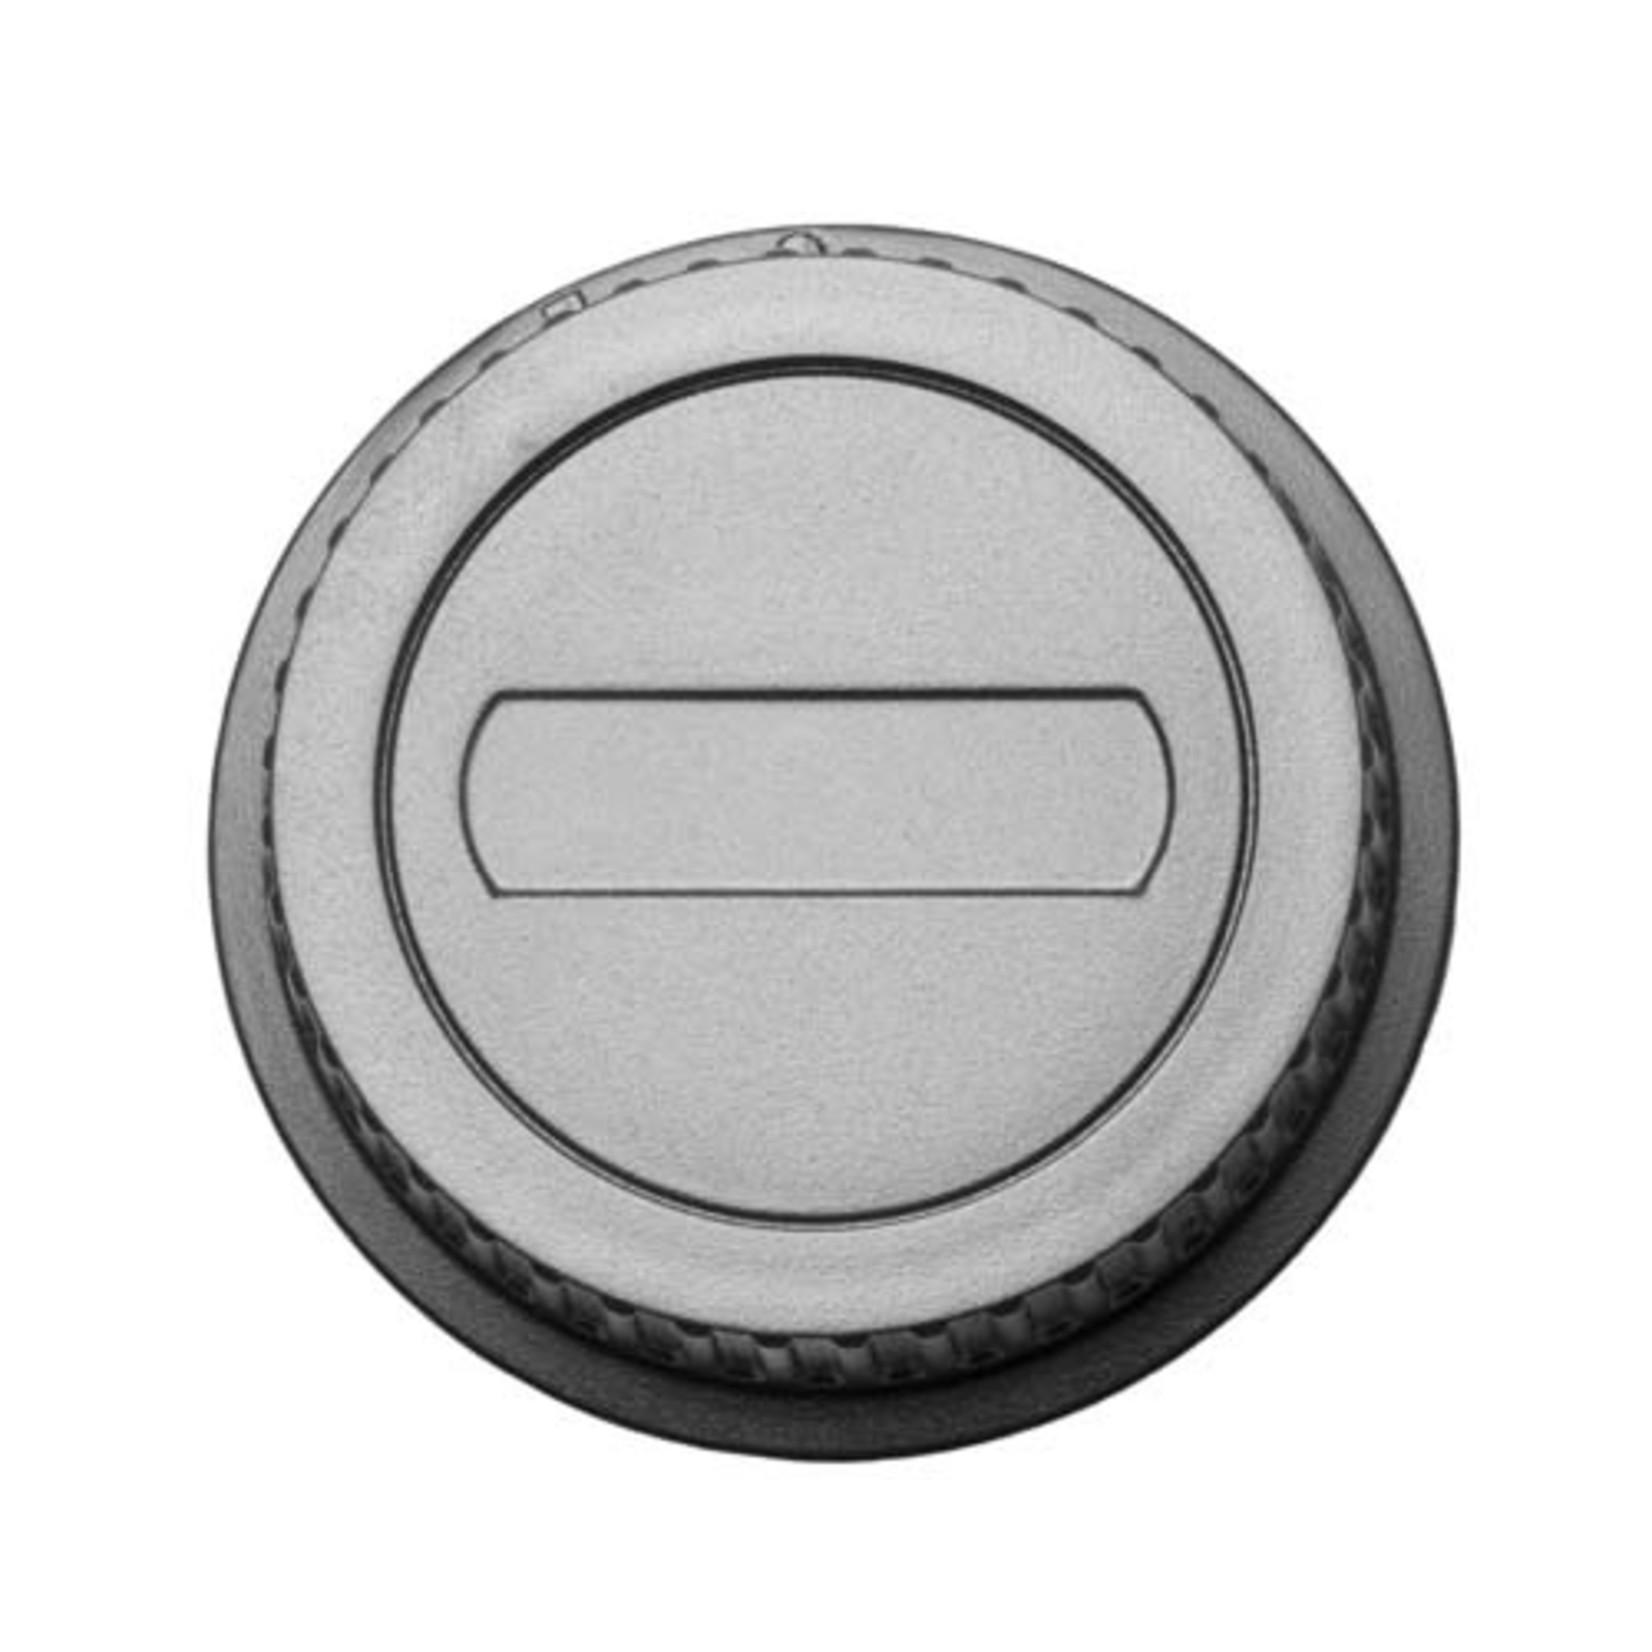 ProMaster Rear Lens Cap - Nikon F - for Nikon